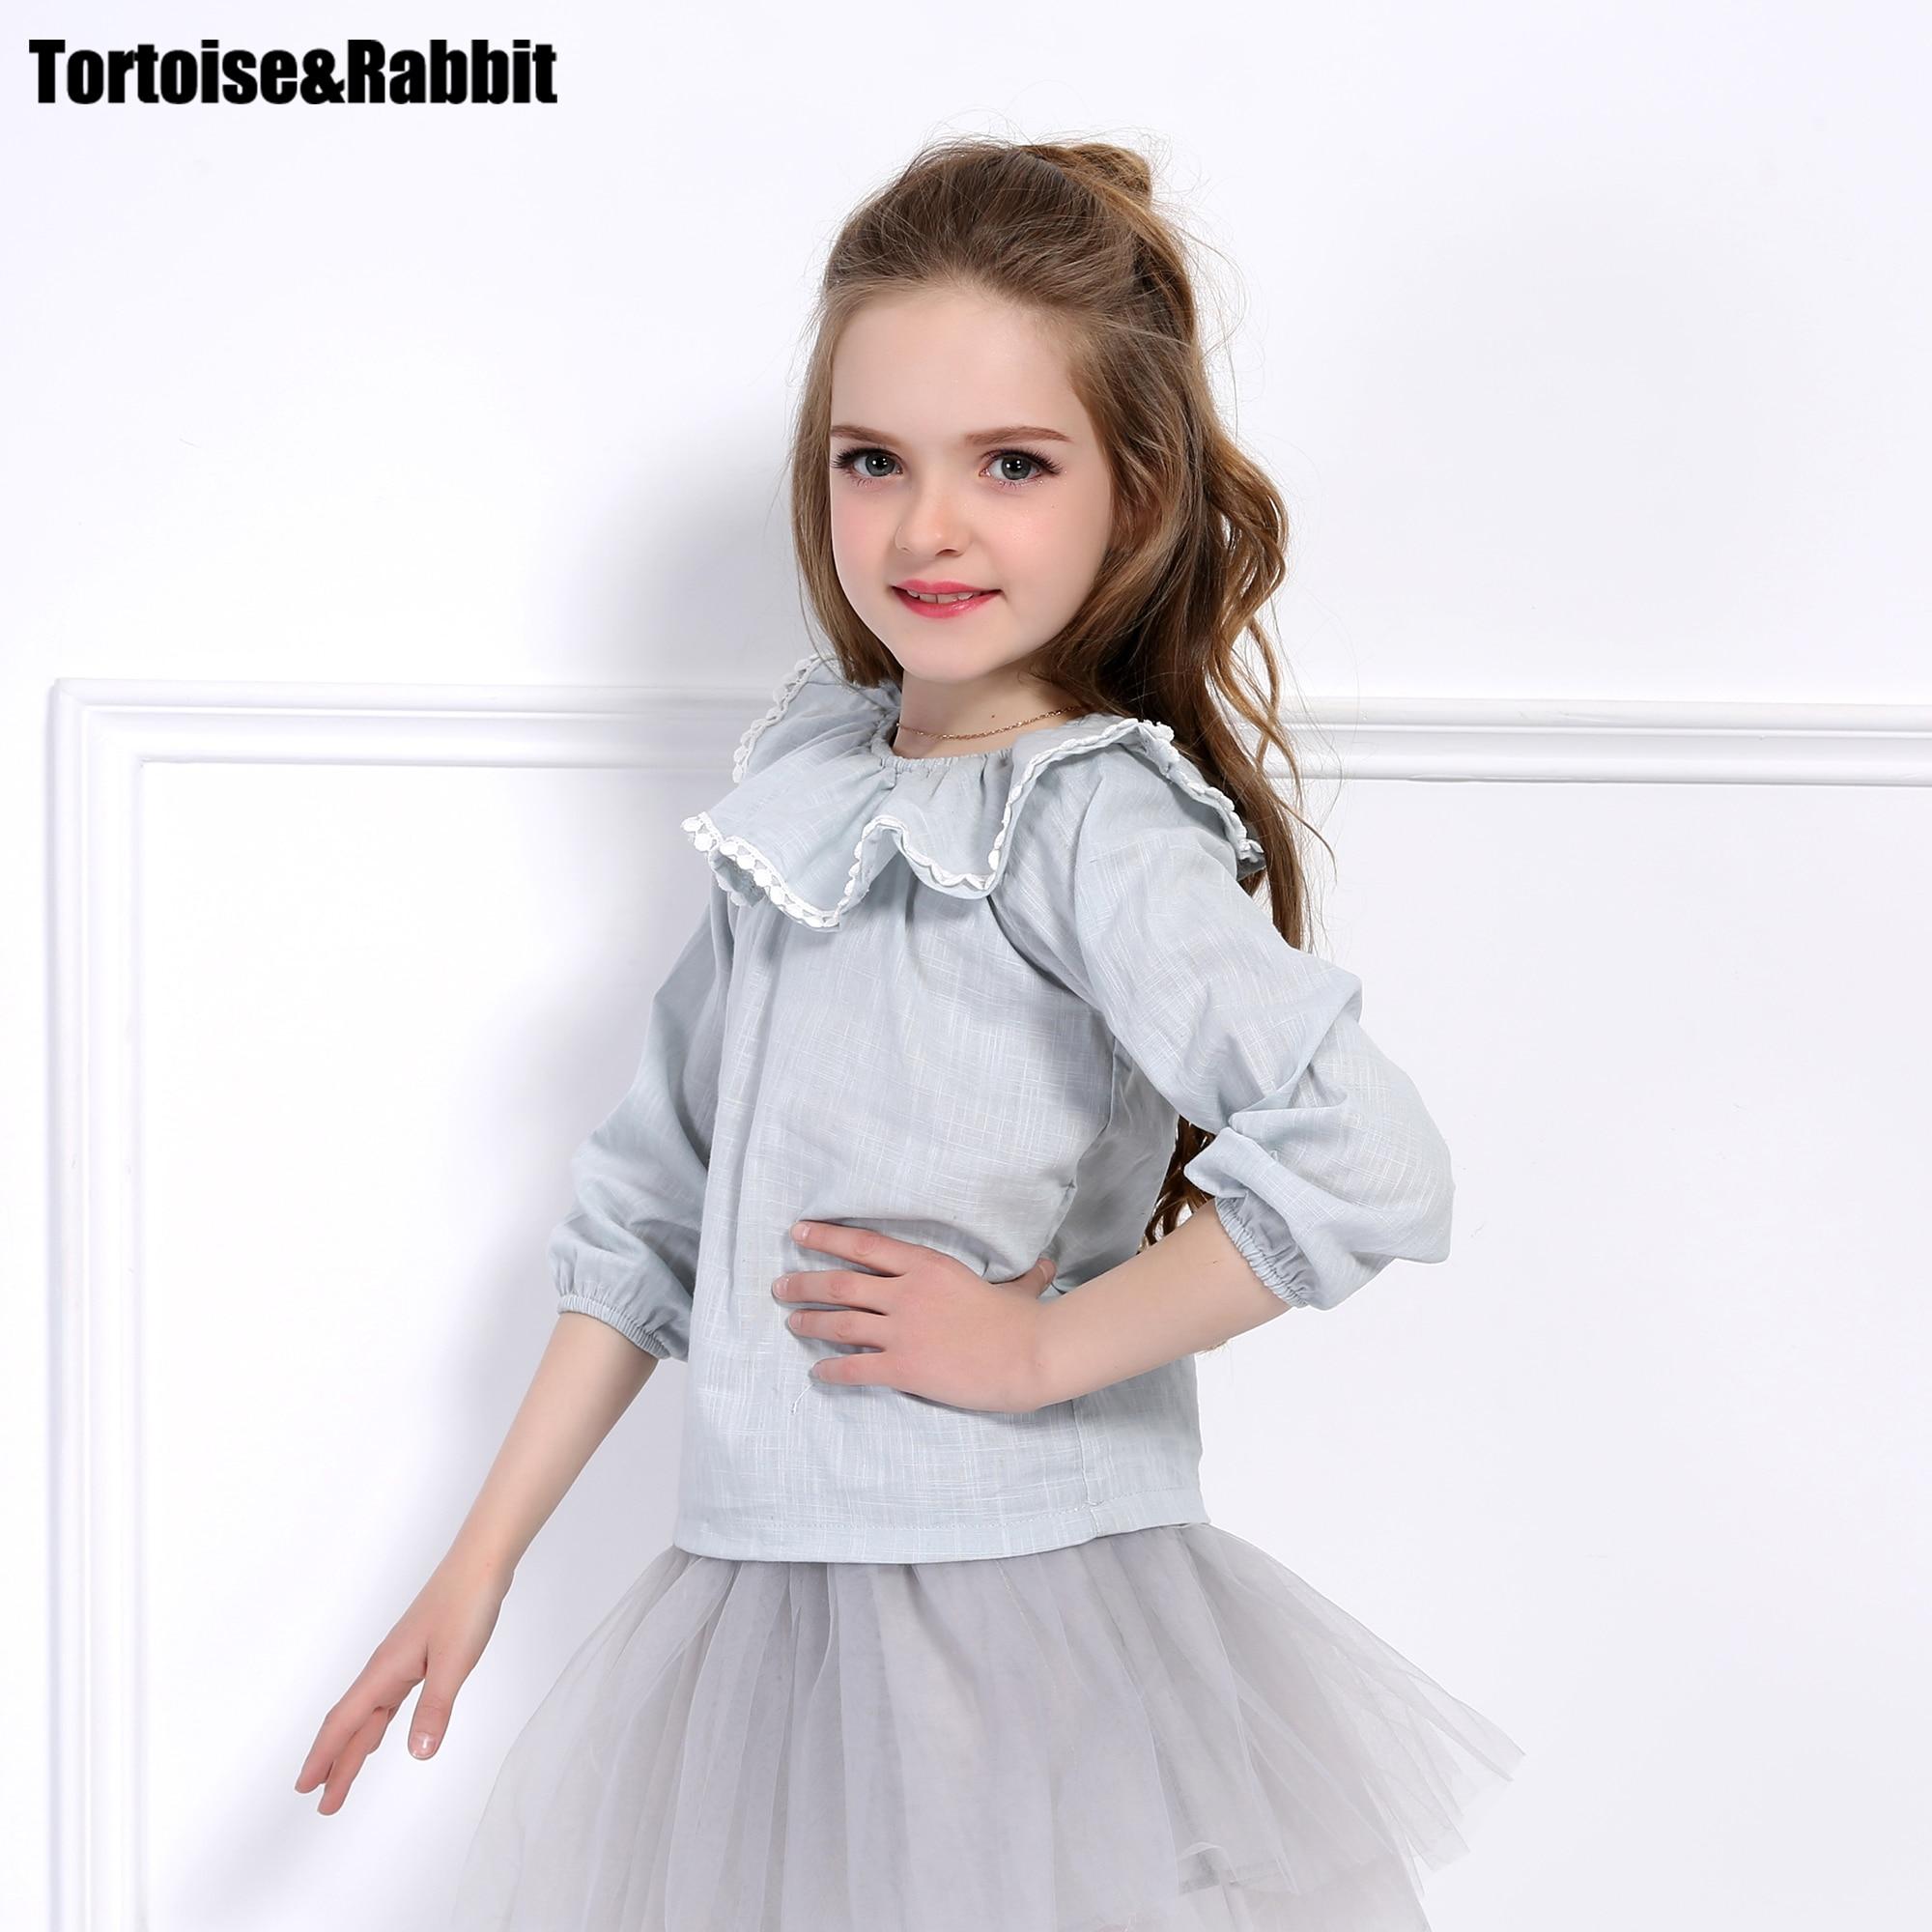 2PCS Toddler Kids Baby Girl Summer Outfit Clothes Shirt Tops+Shorts Pants Set UK. £ Free P&P.